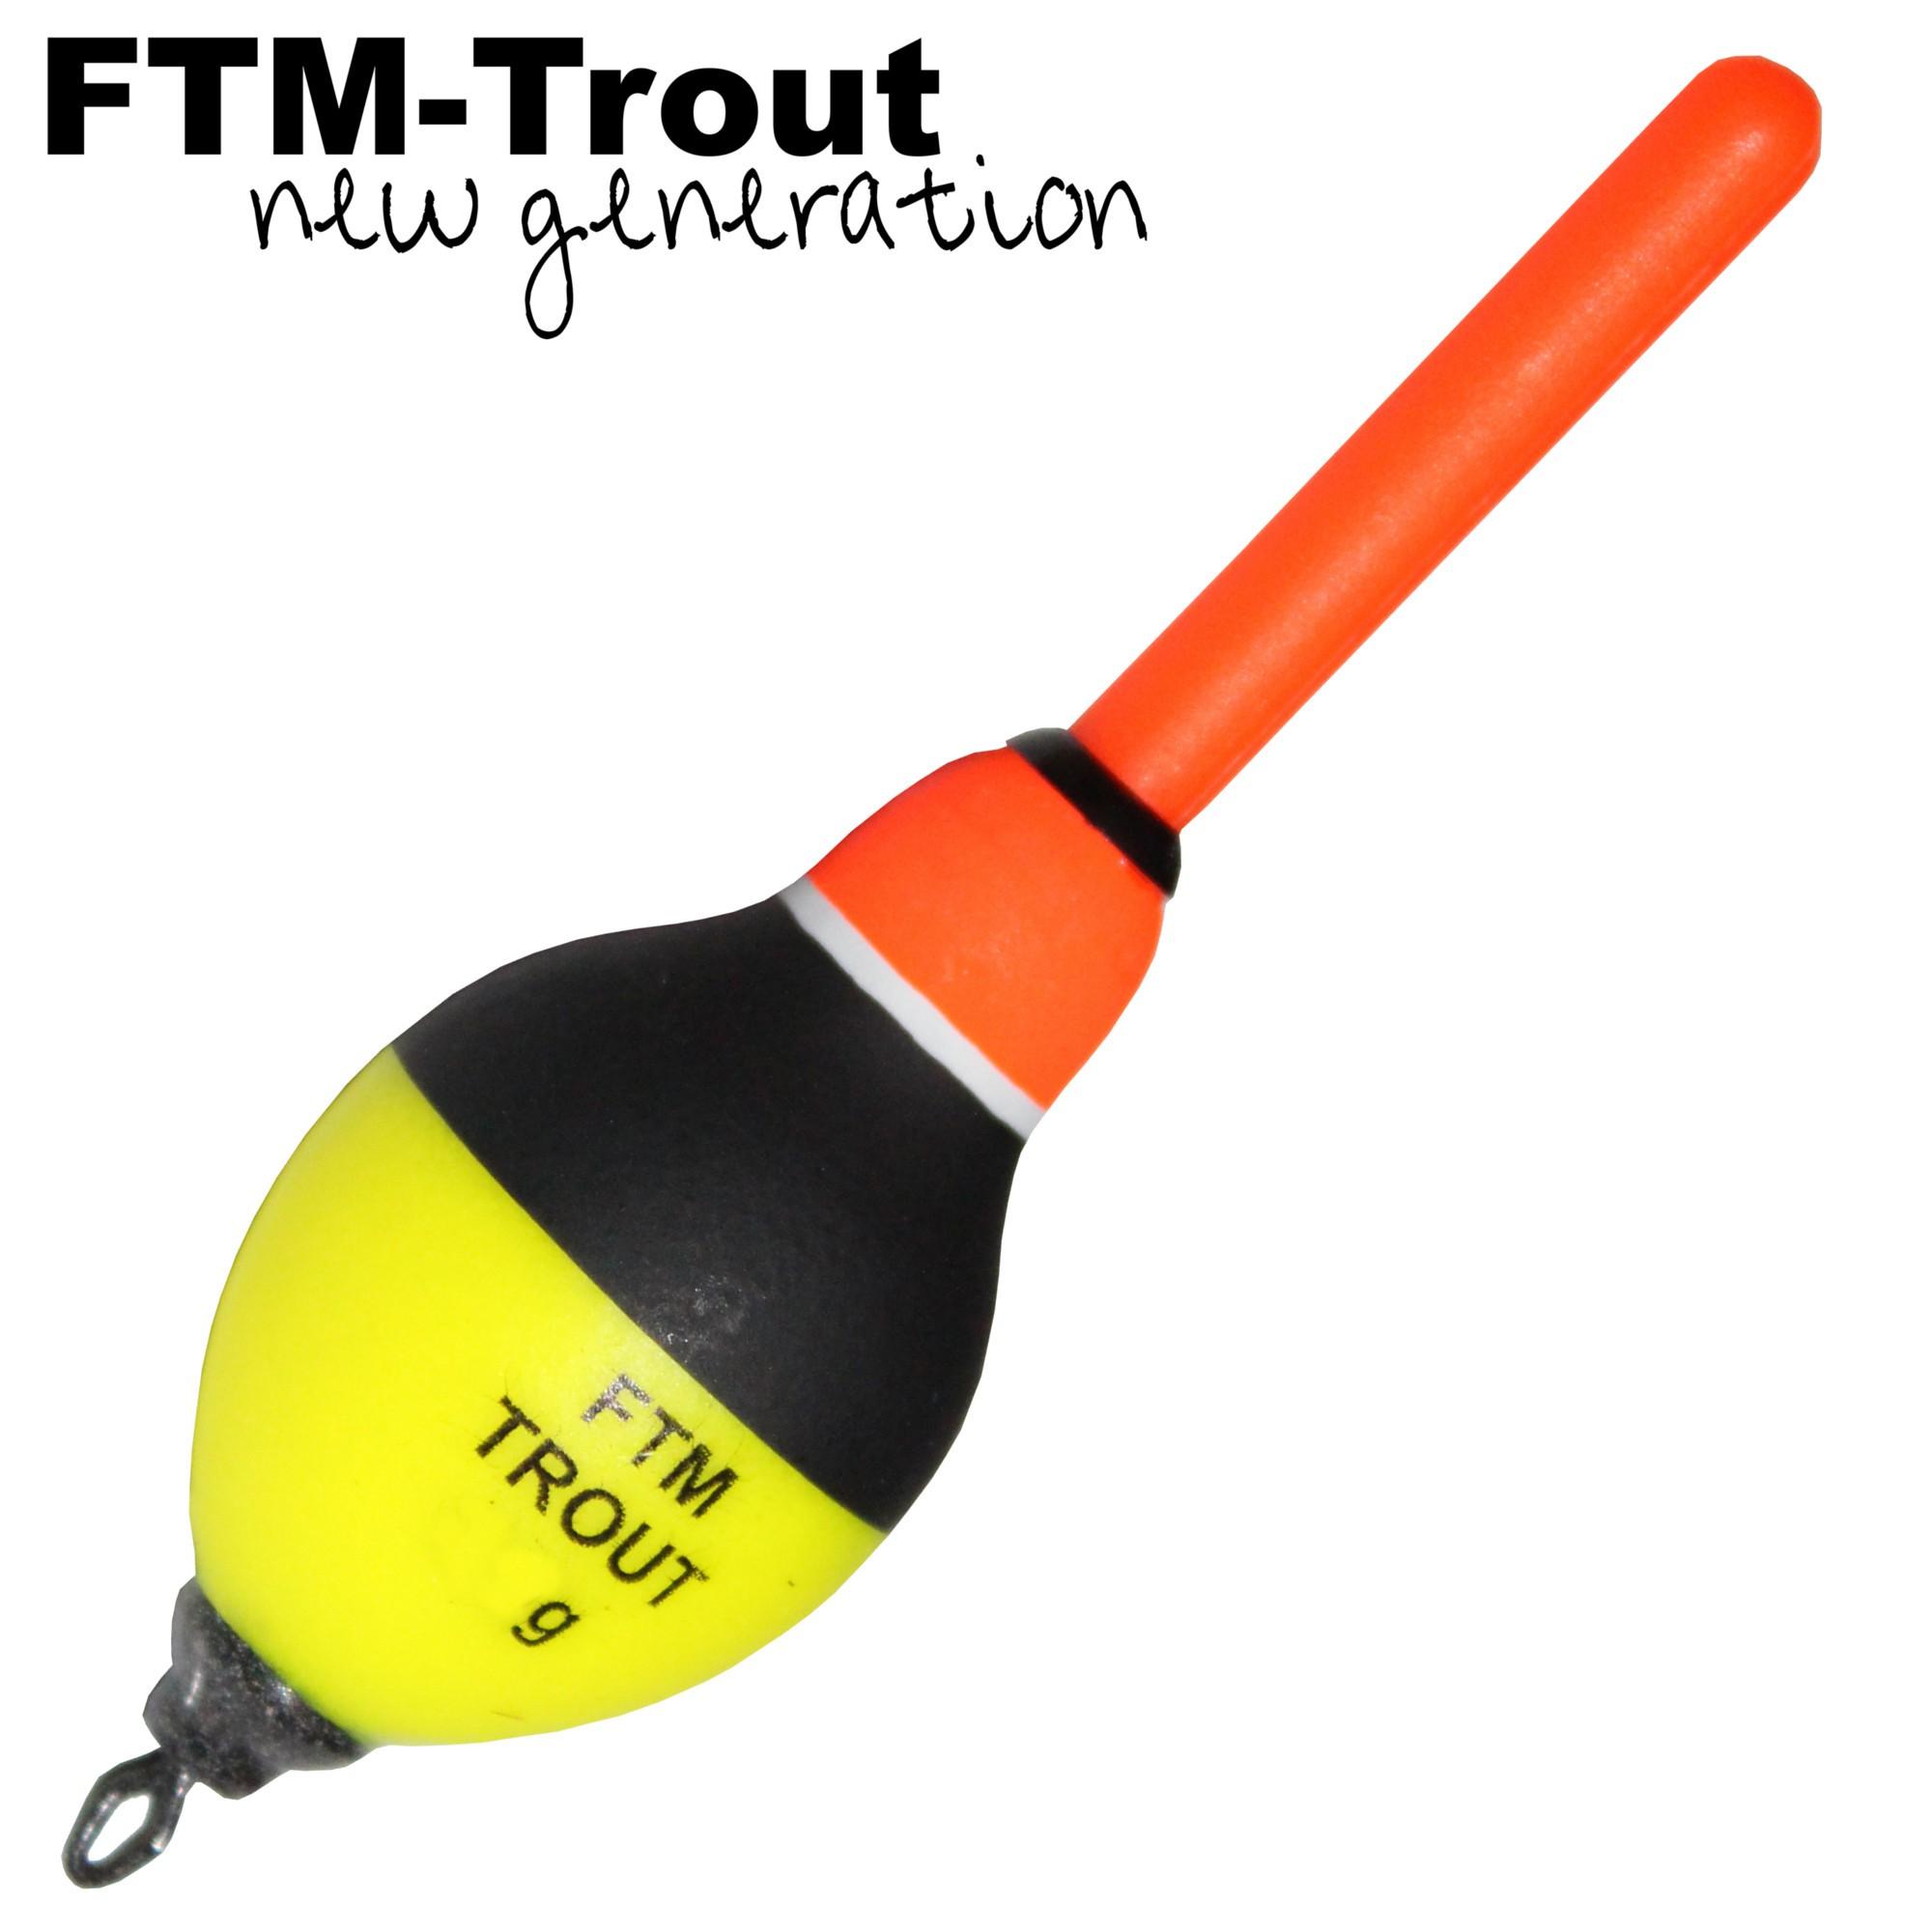 FTM Slider Knicklicht Forellenpose Laufpose Schwimmer Trot Fishing Forelle